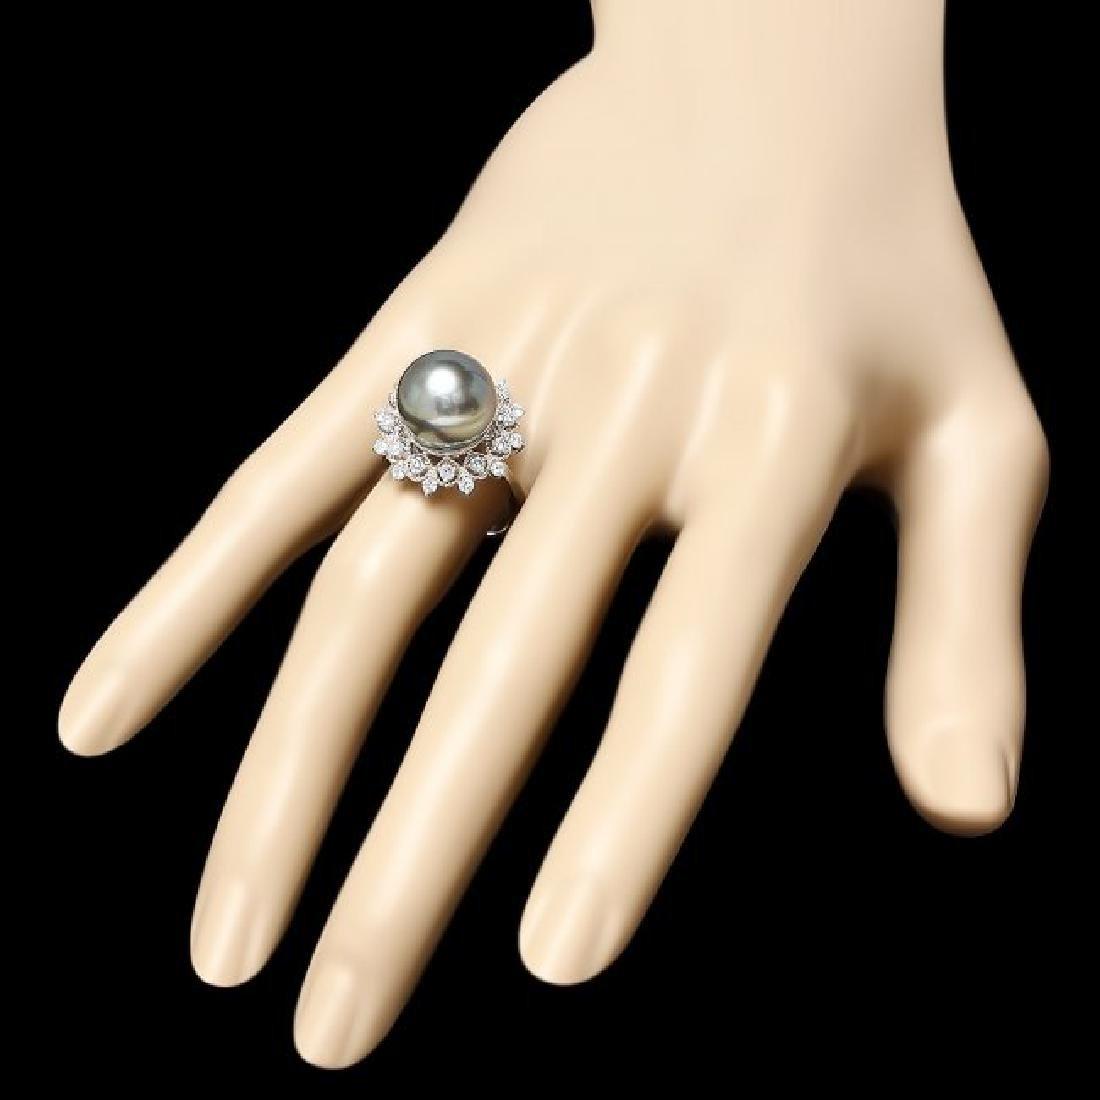 14k Gold 12 X 12mm Pearl 0.60ct Diamond Ring - 3